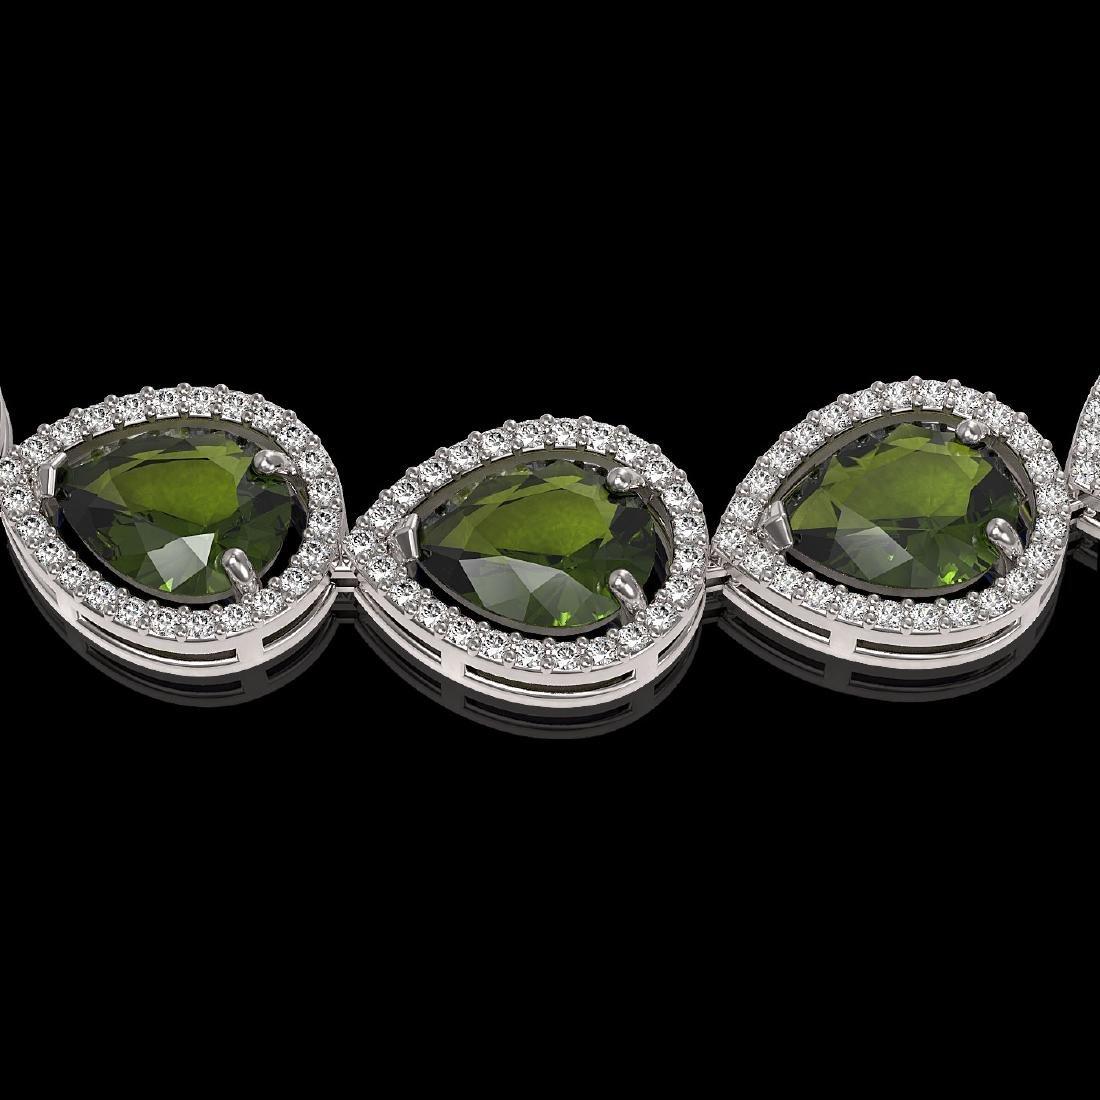 41.6 CTW Tourmaline & Diamond Halo Necklace 10K White - 3